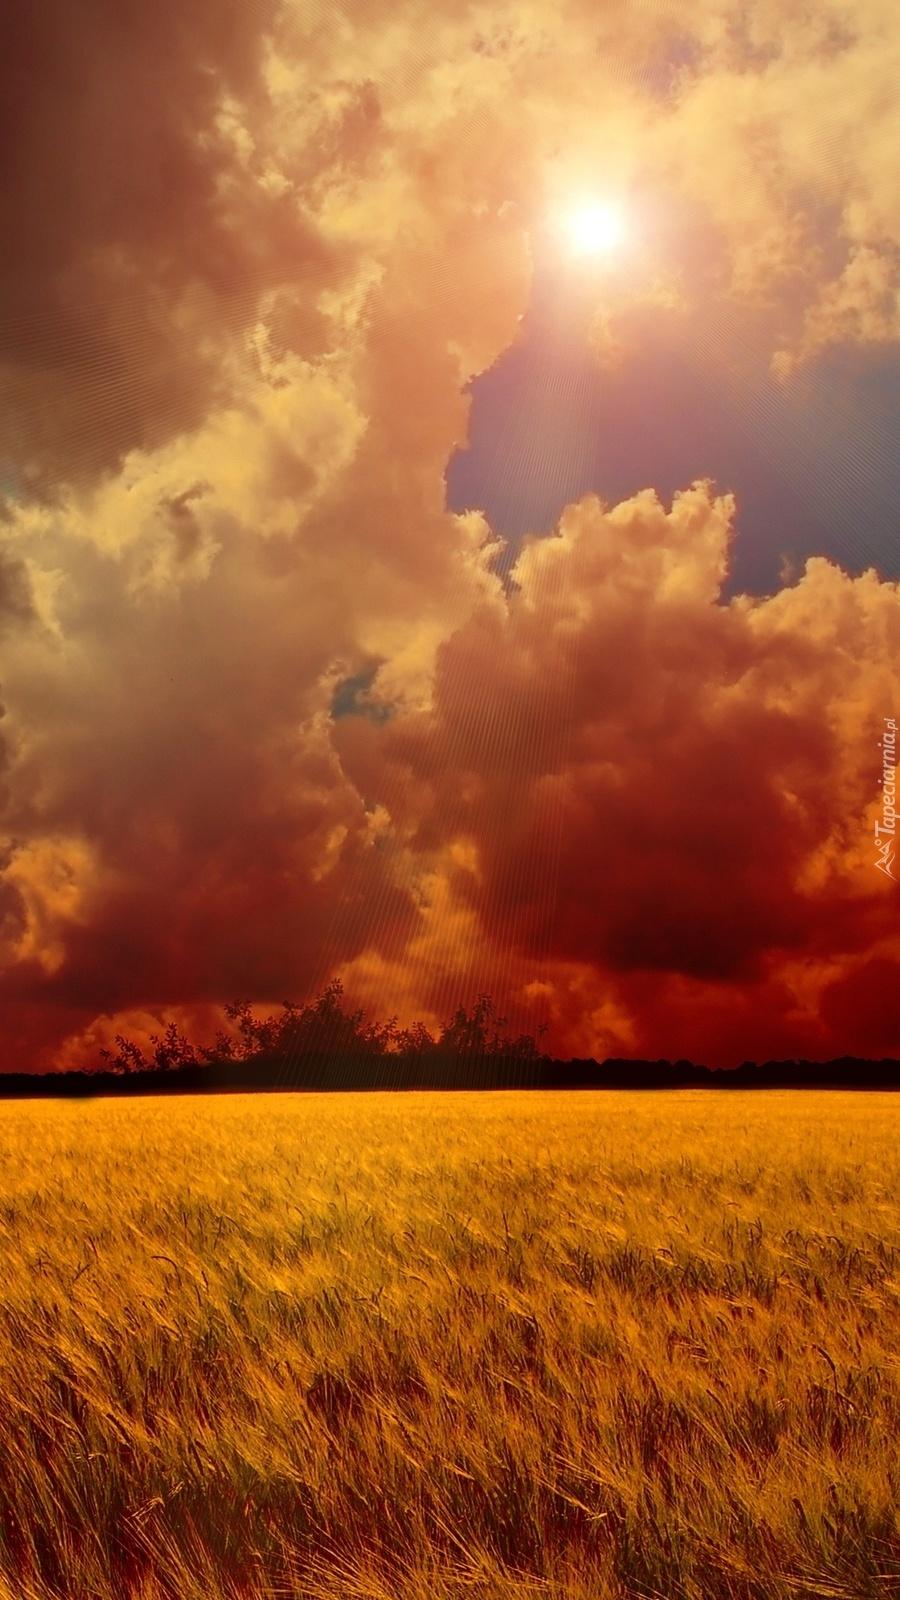 Łany zboża pod chmurami